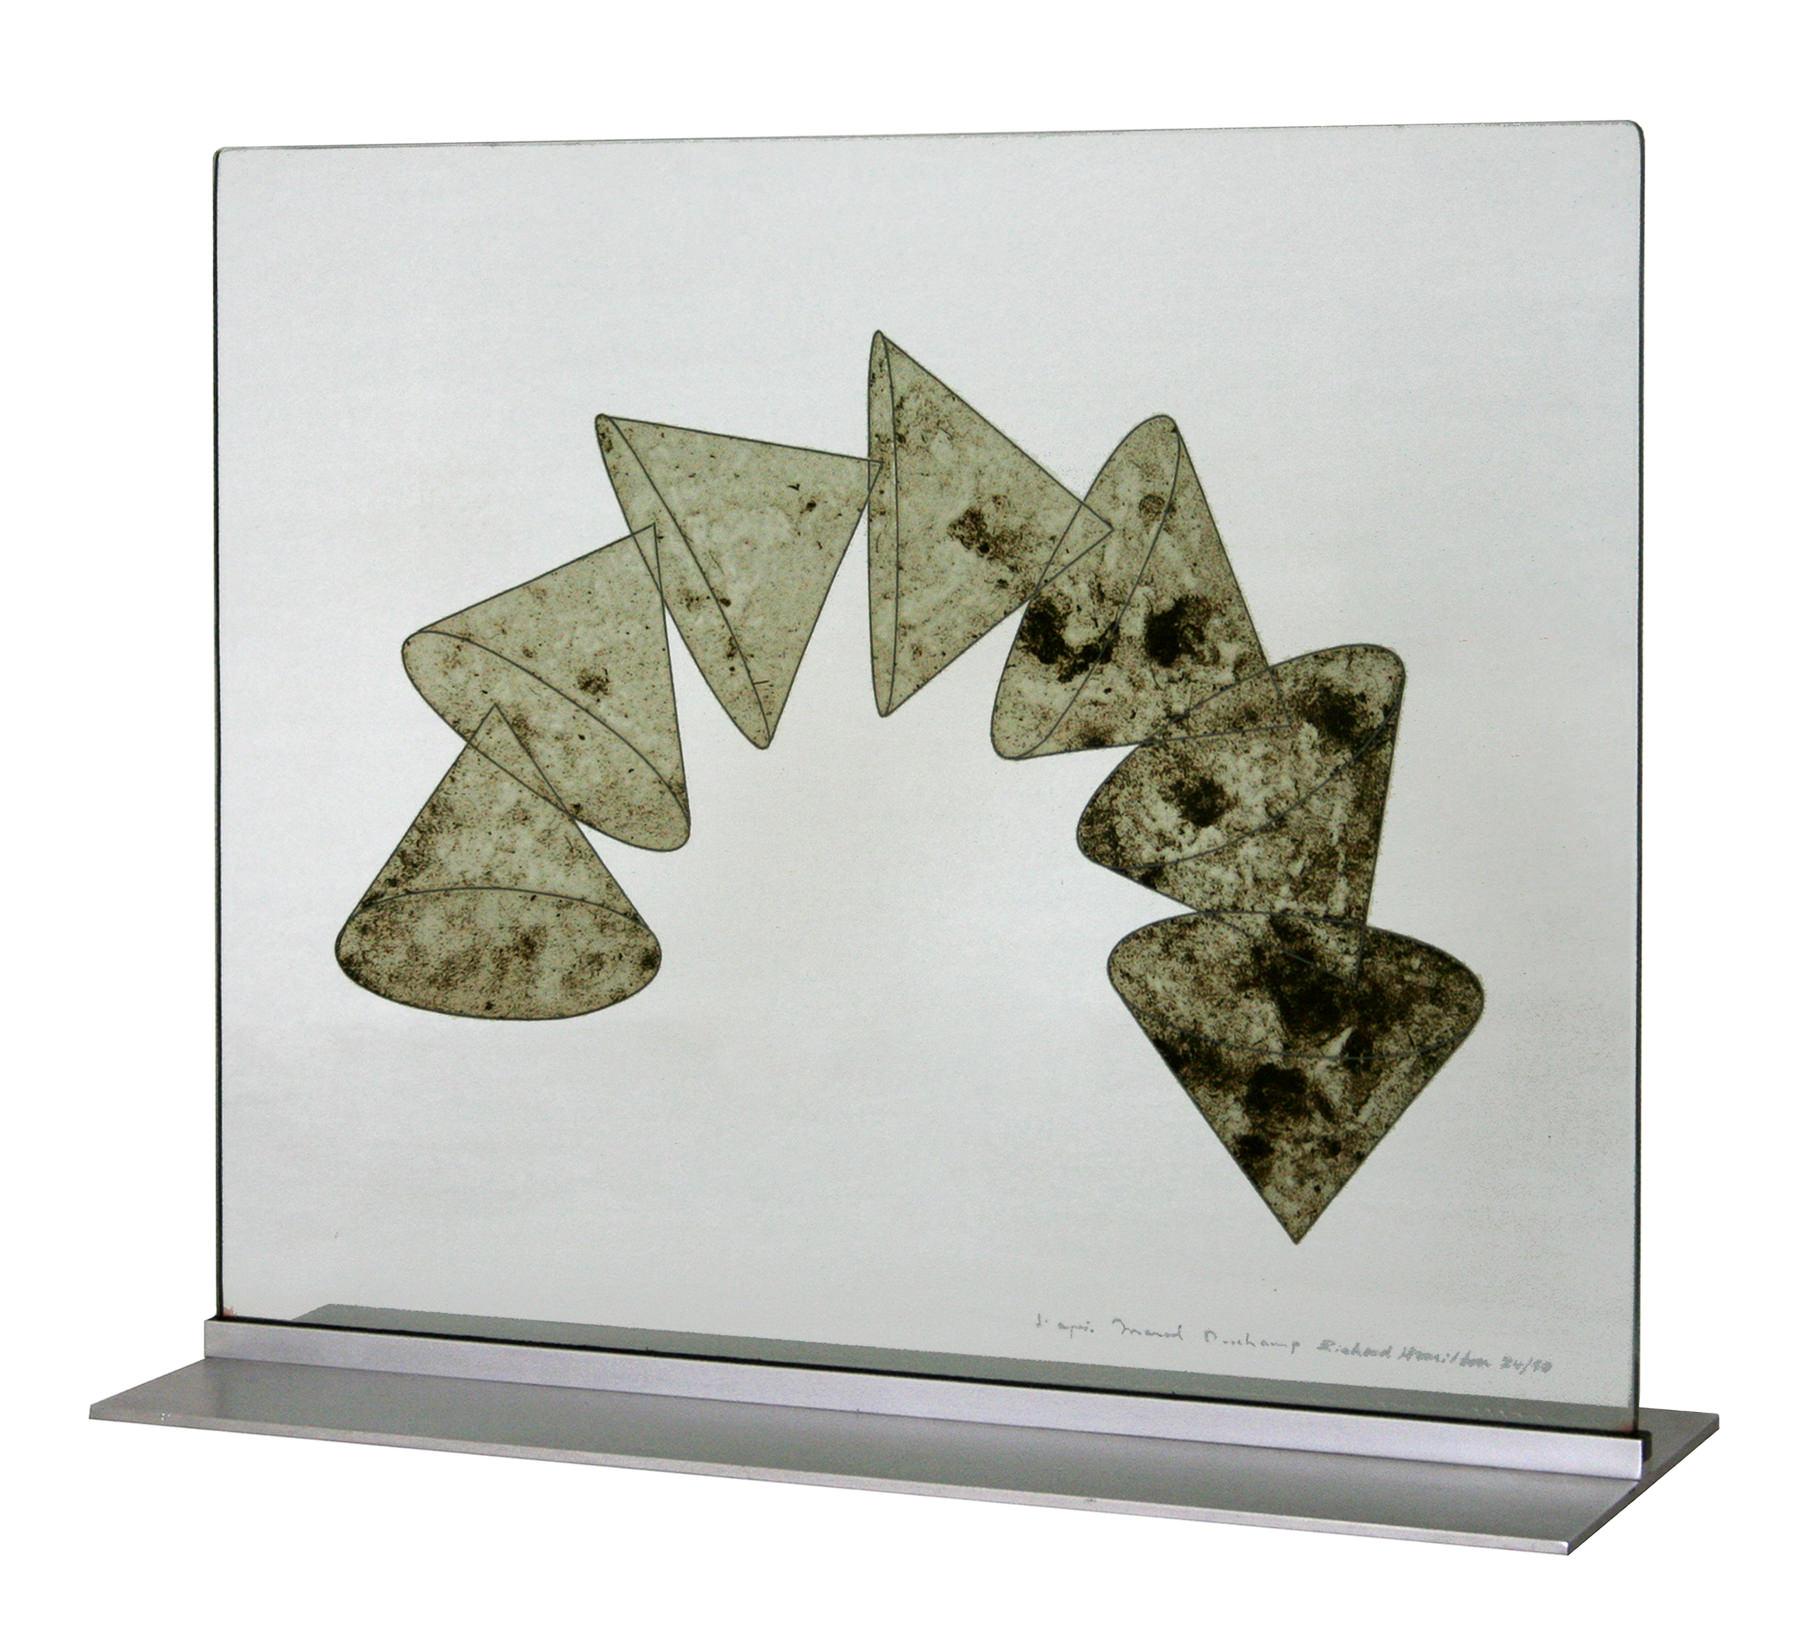 Richard Hamilton - Sieves (with Marcel Duchamp)